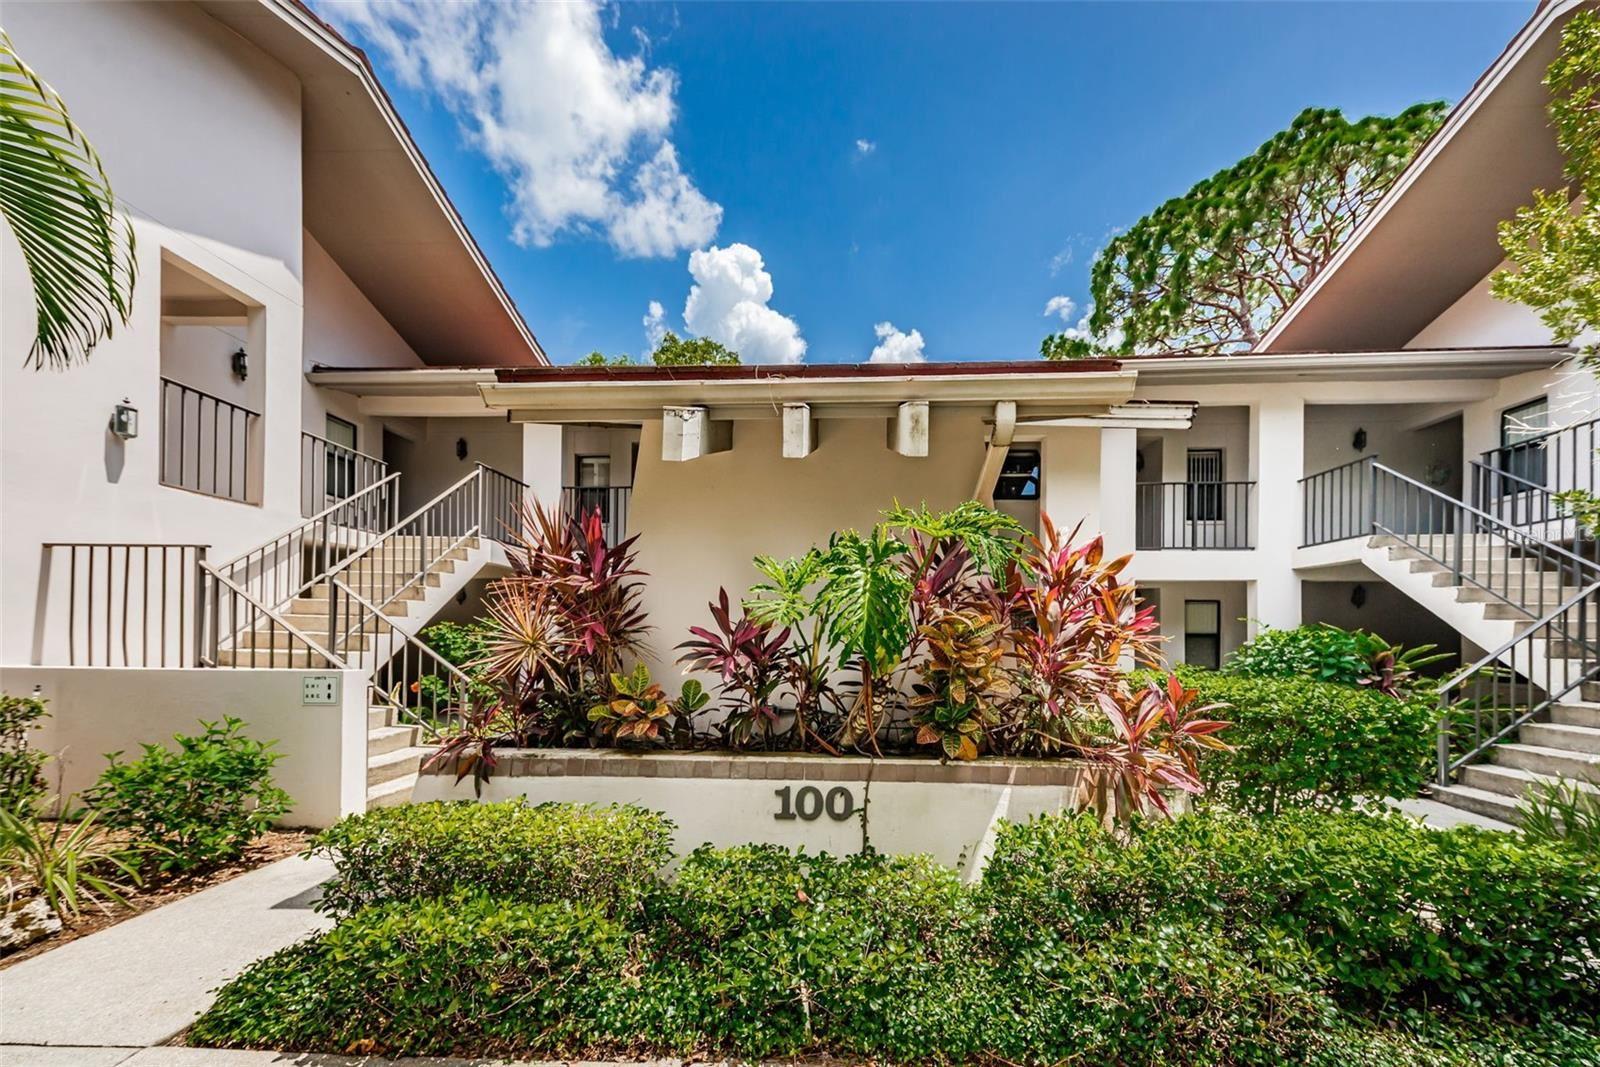 300 S FLORIDA AVENUE #100G, Tarpon Springs, FL 34689 - MLS#: U8131012